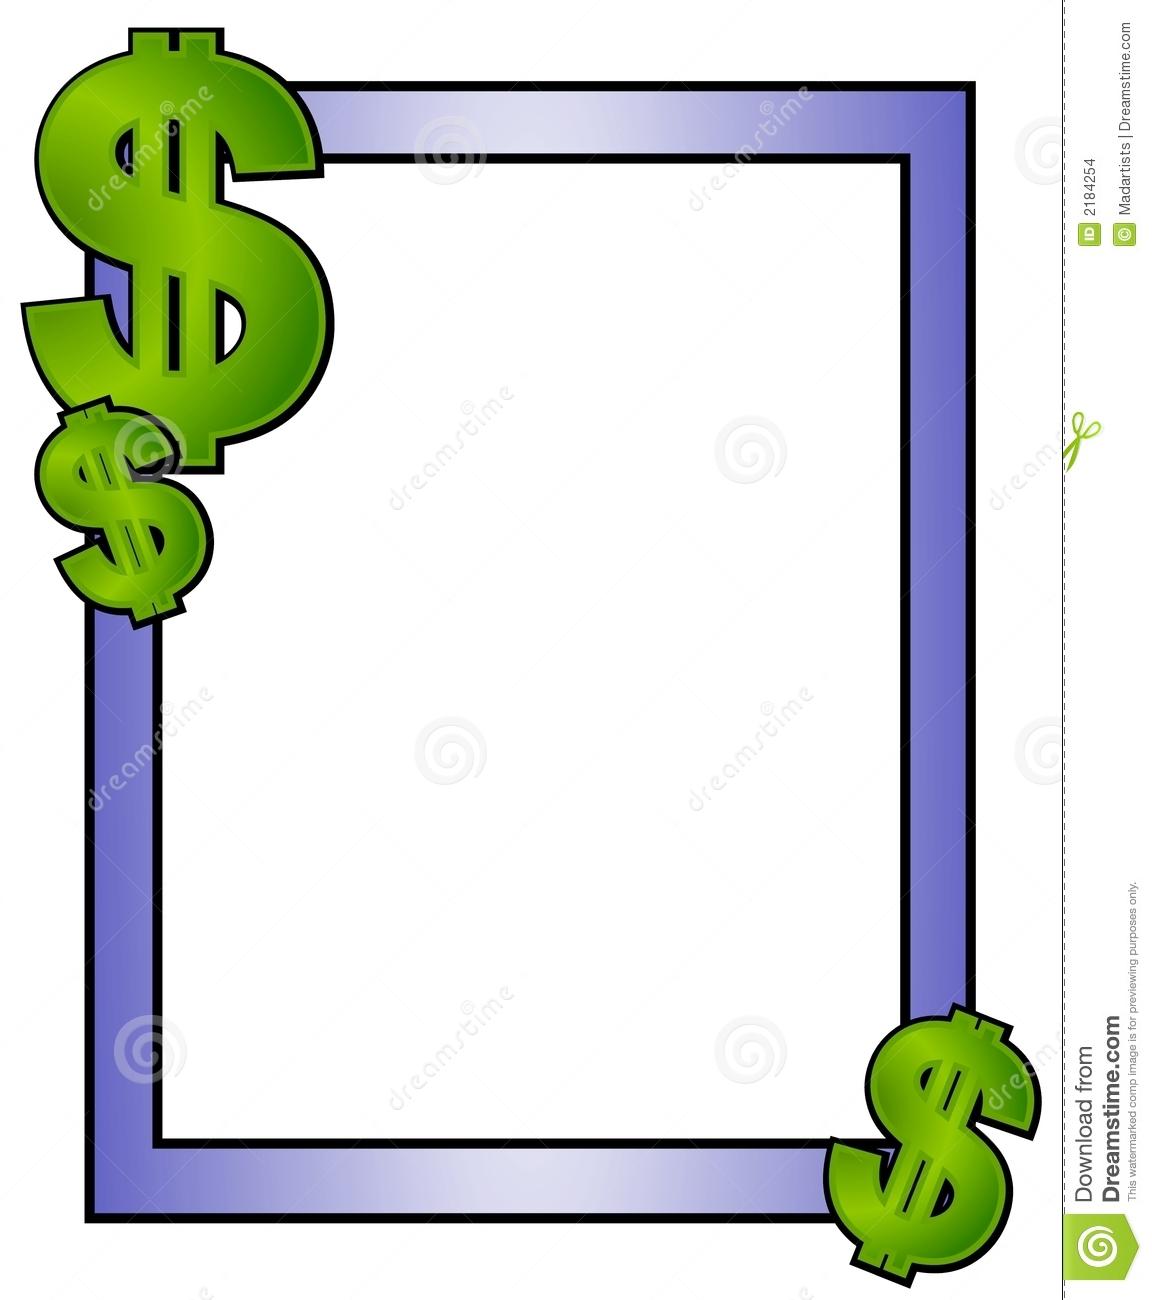 61+ Money Border Clip Art.